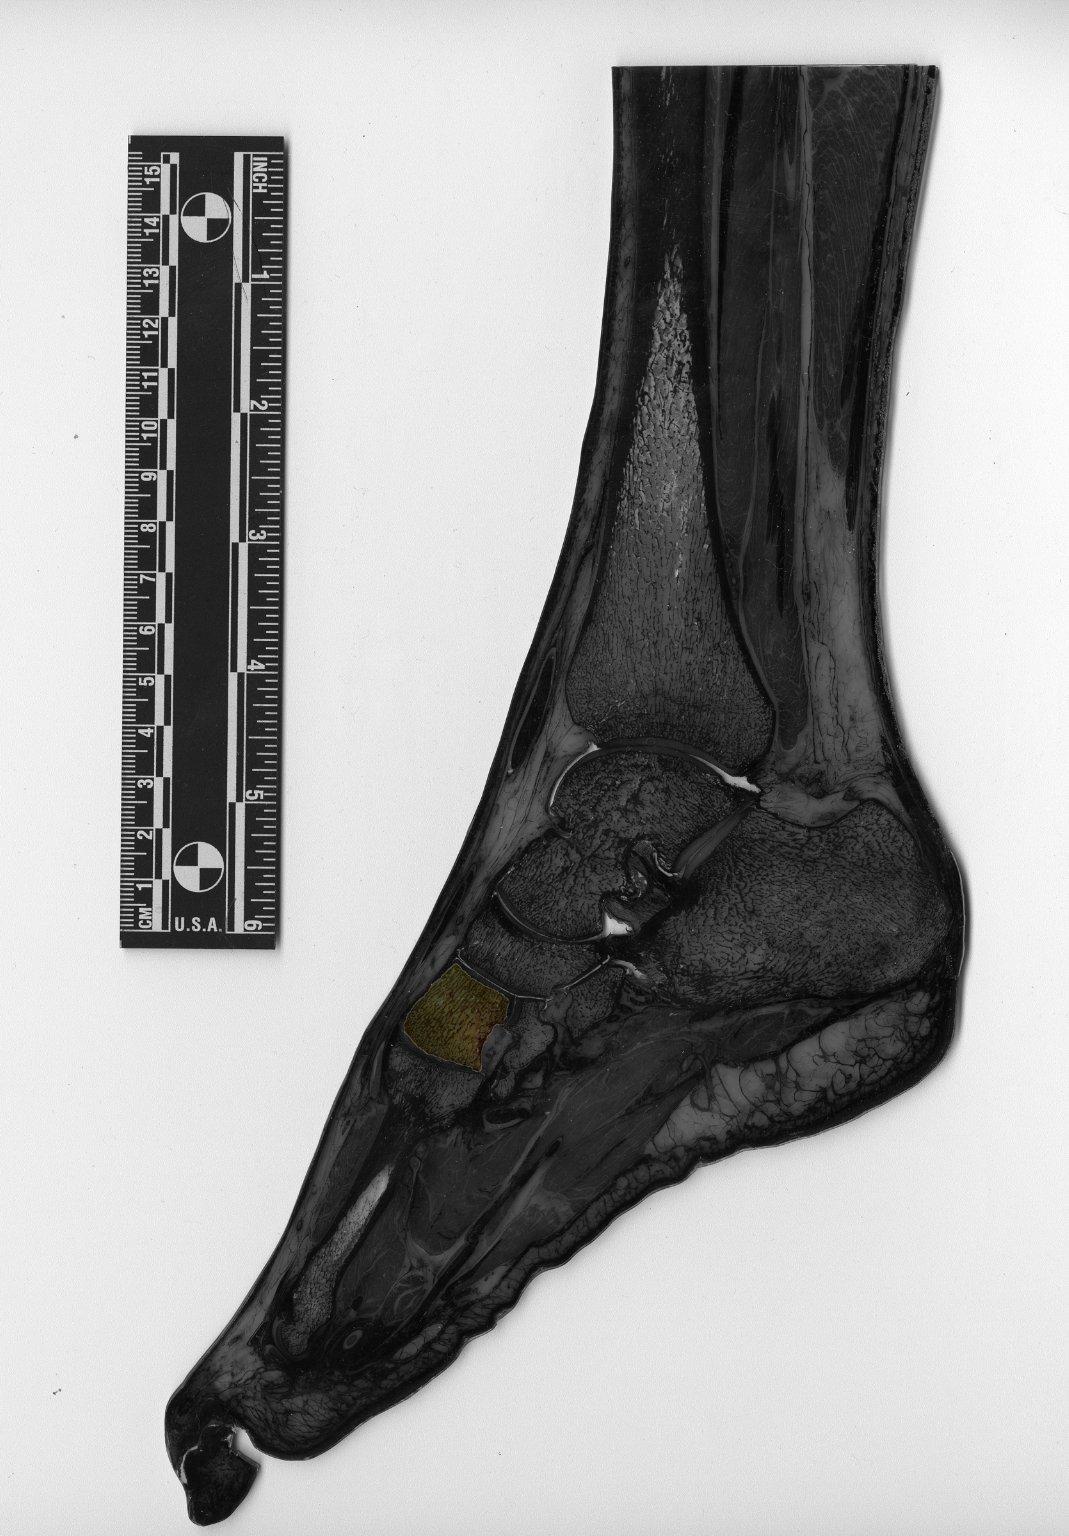 Plastinated human foot